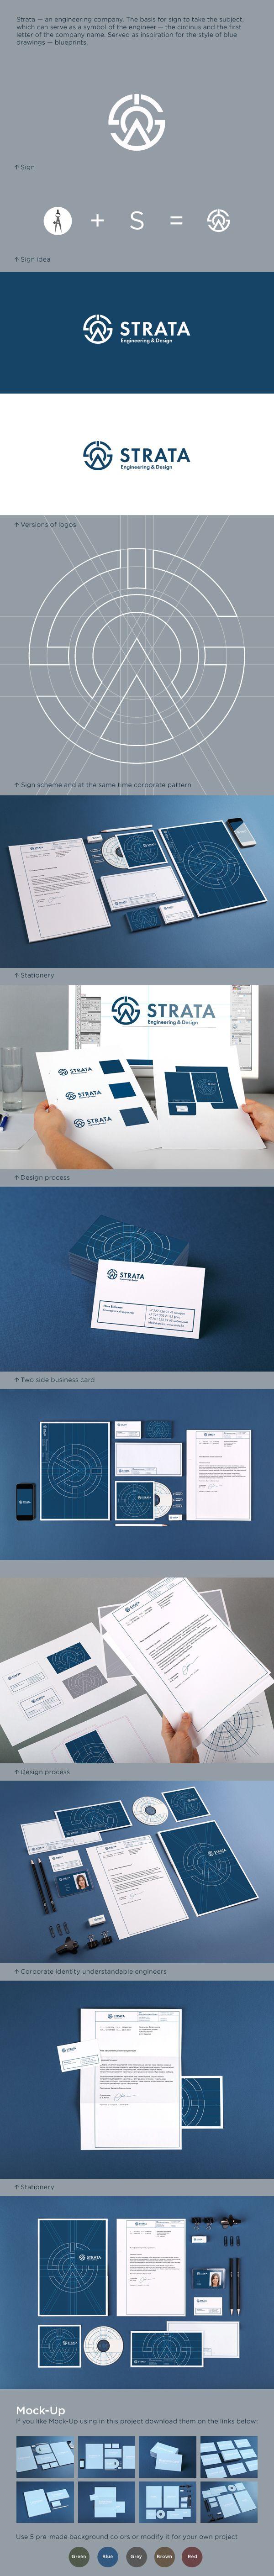 Strata. Logo & corporate identity on Branding Served